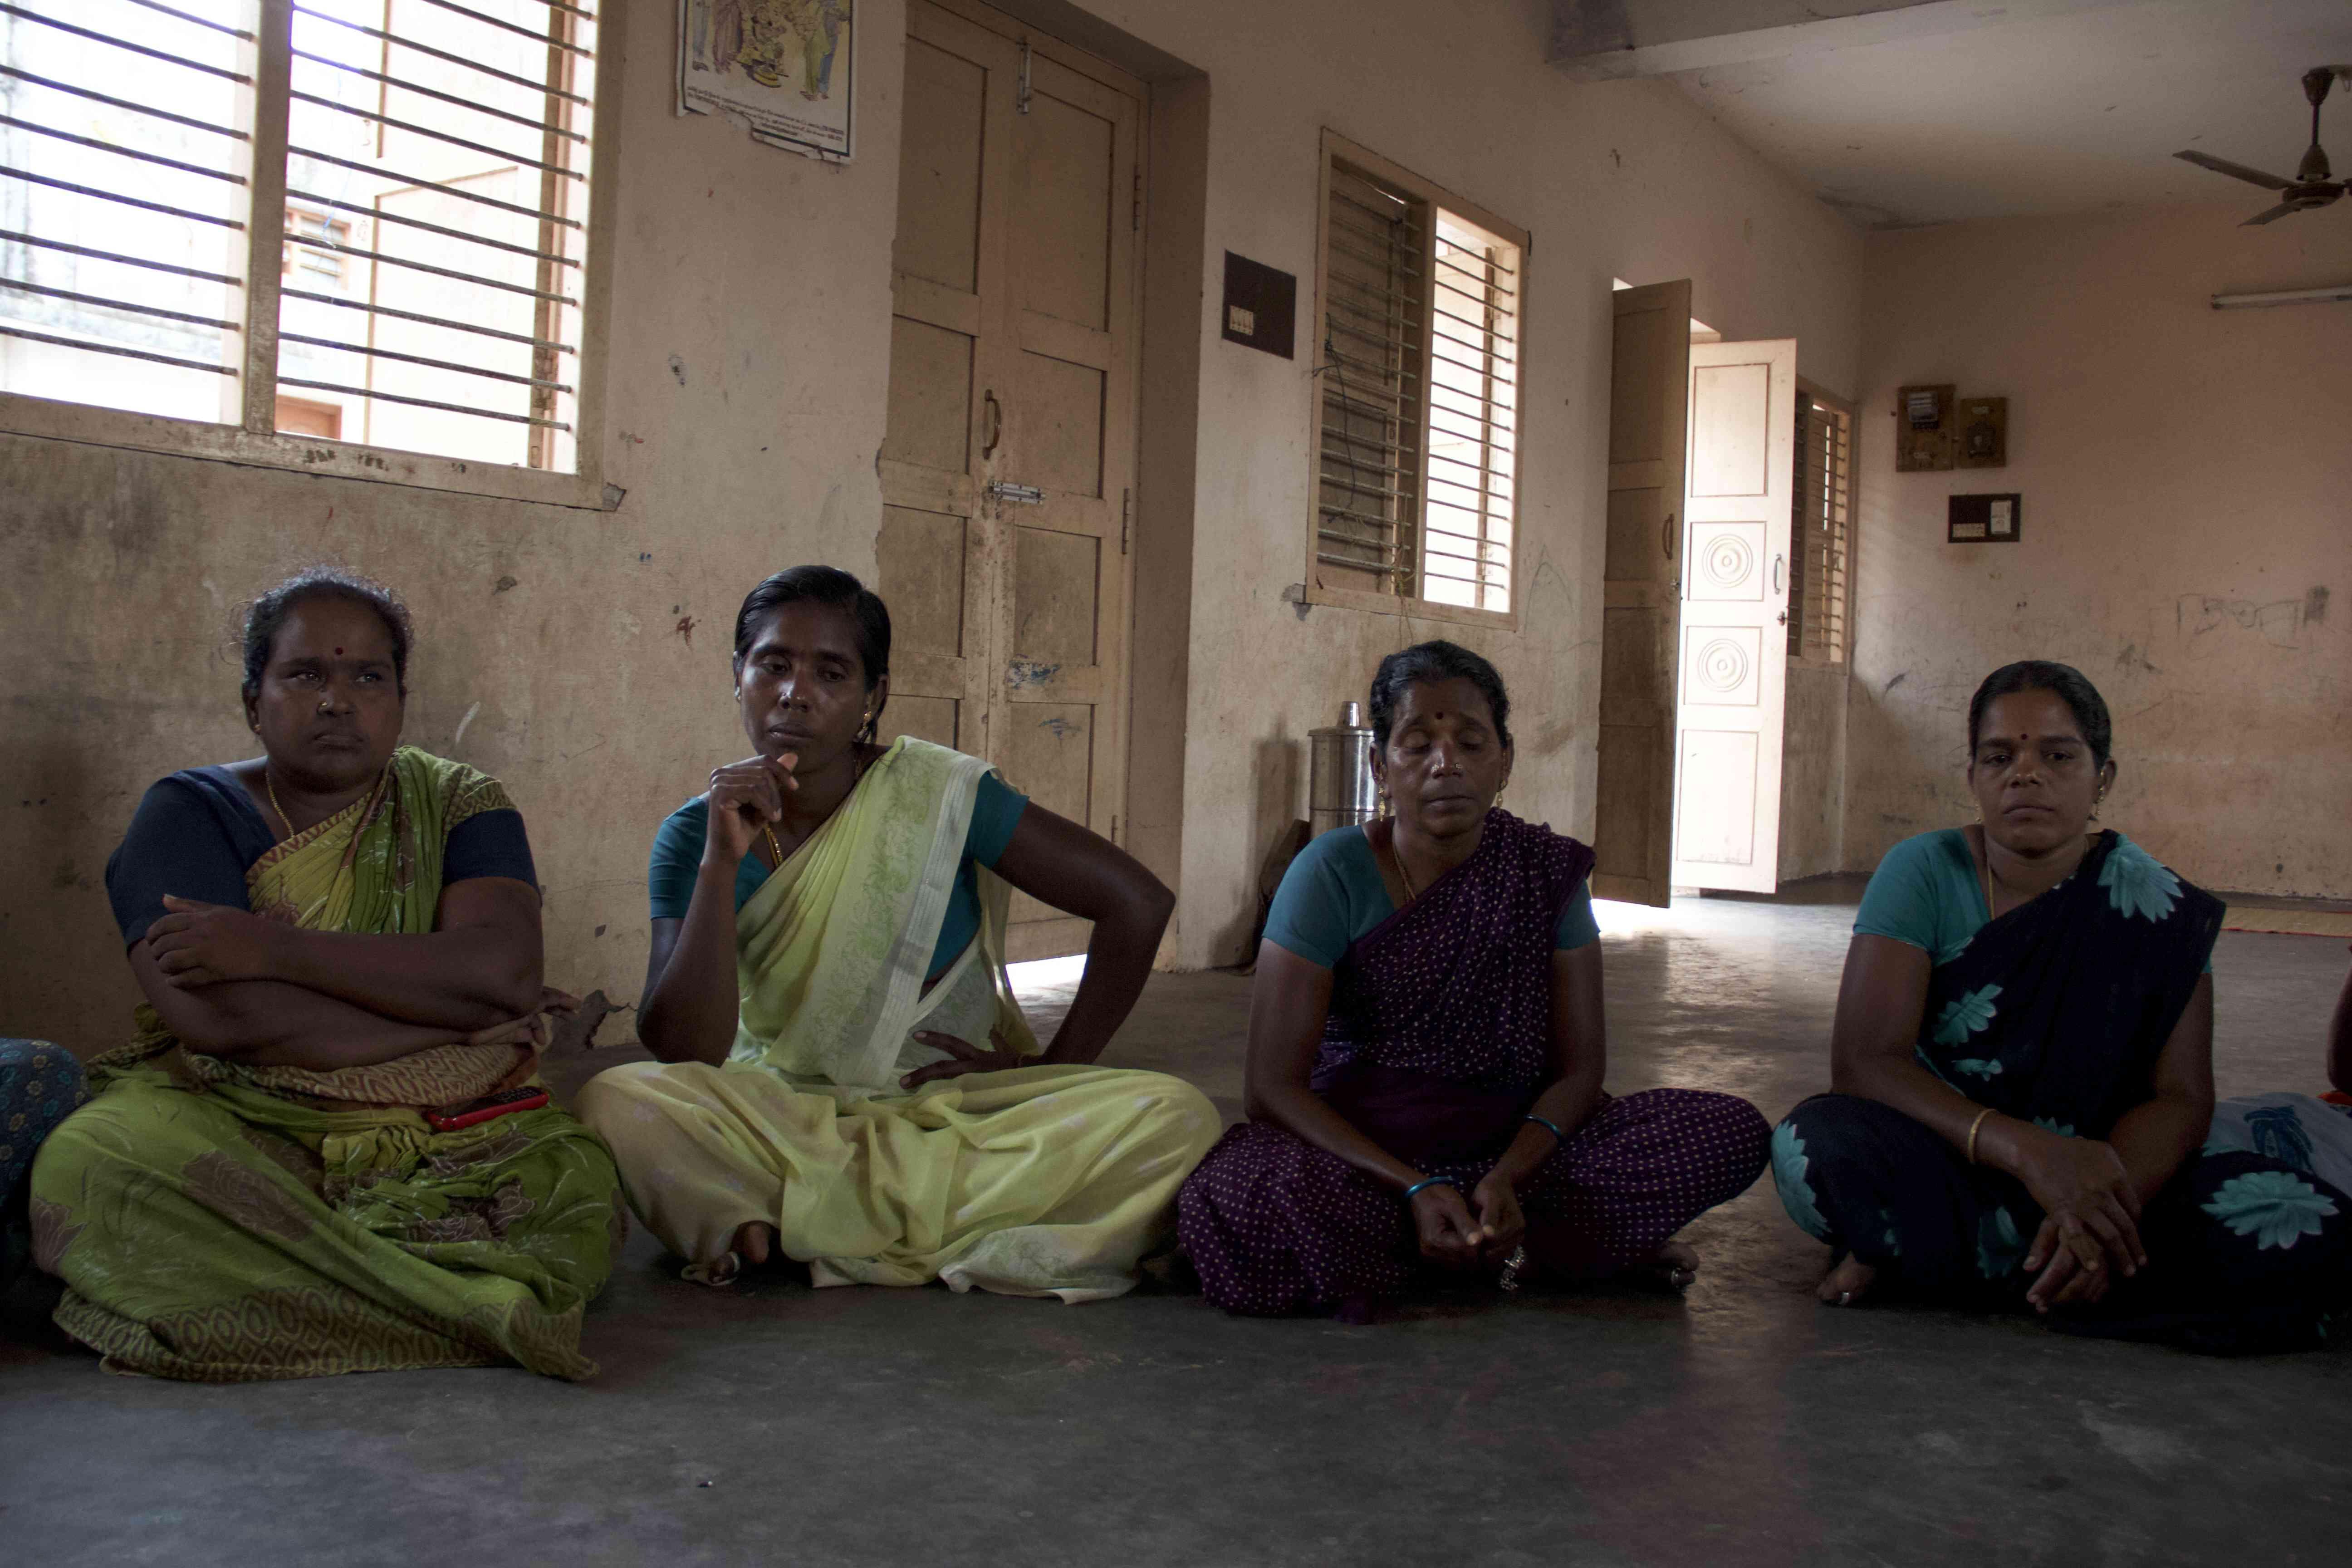 Women fish workers at Vellapalam village in Nagapattinam district in Tamil Nadu. Photo Credit: M Palanikumar|Pepcollective